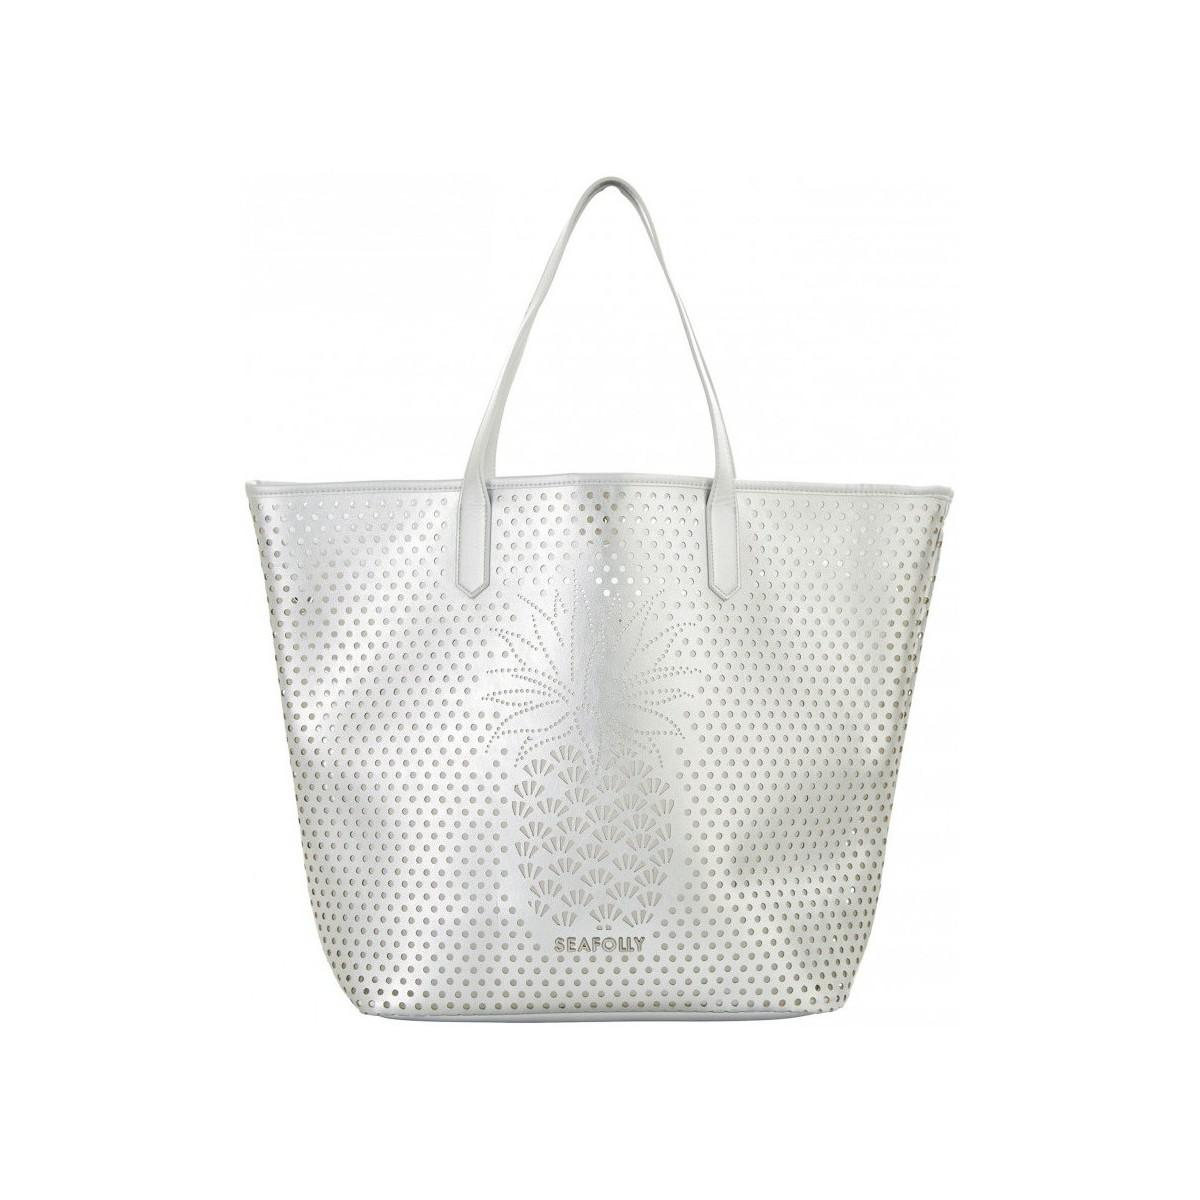 Sky Blue Beach Bag, Luxury Tote Seafolly